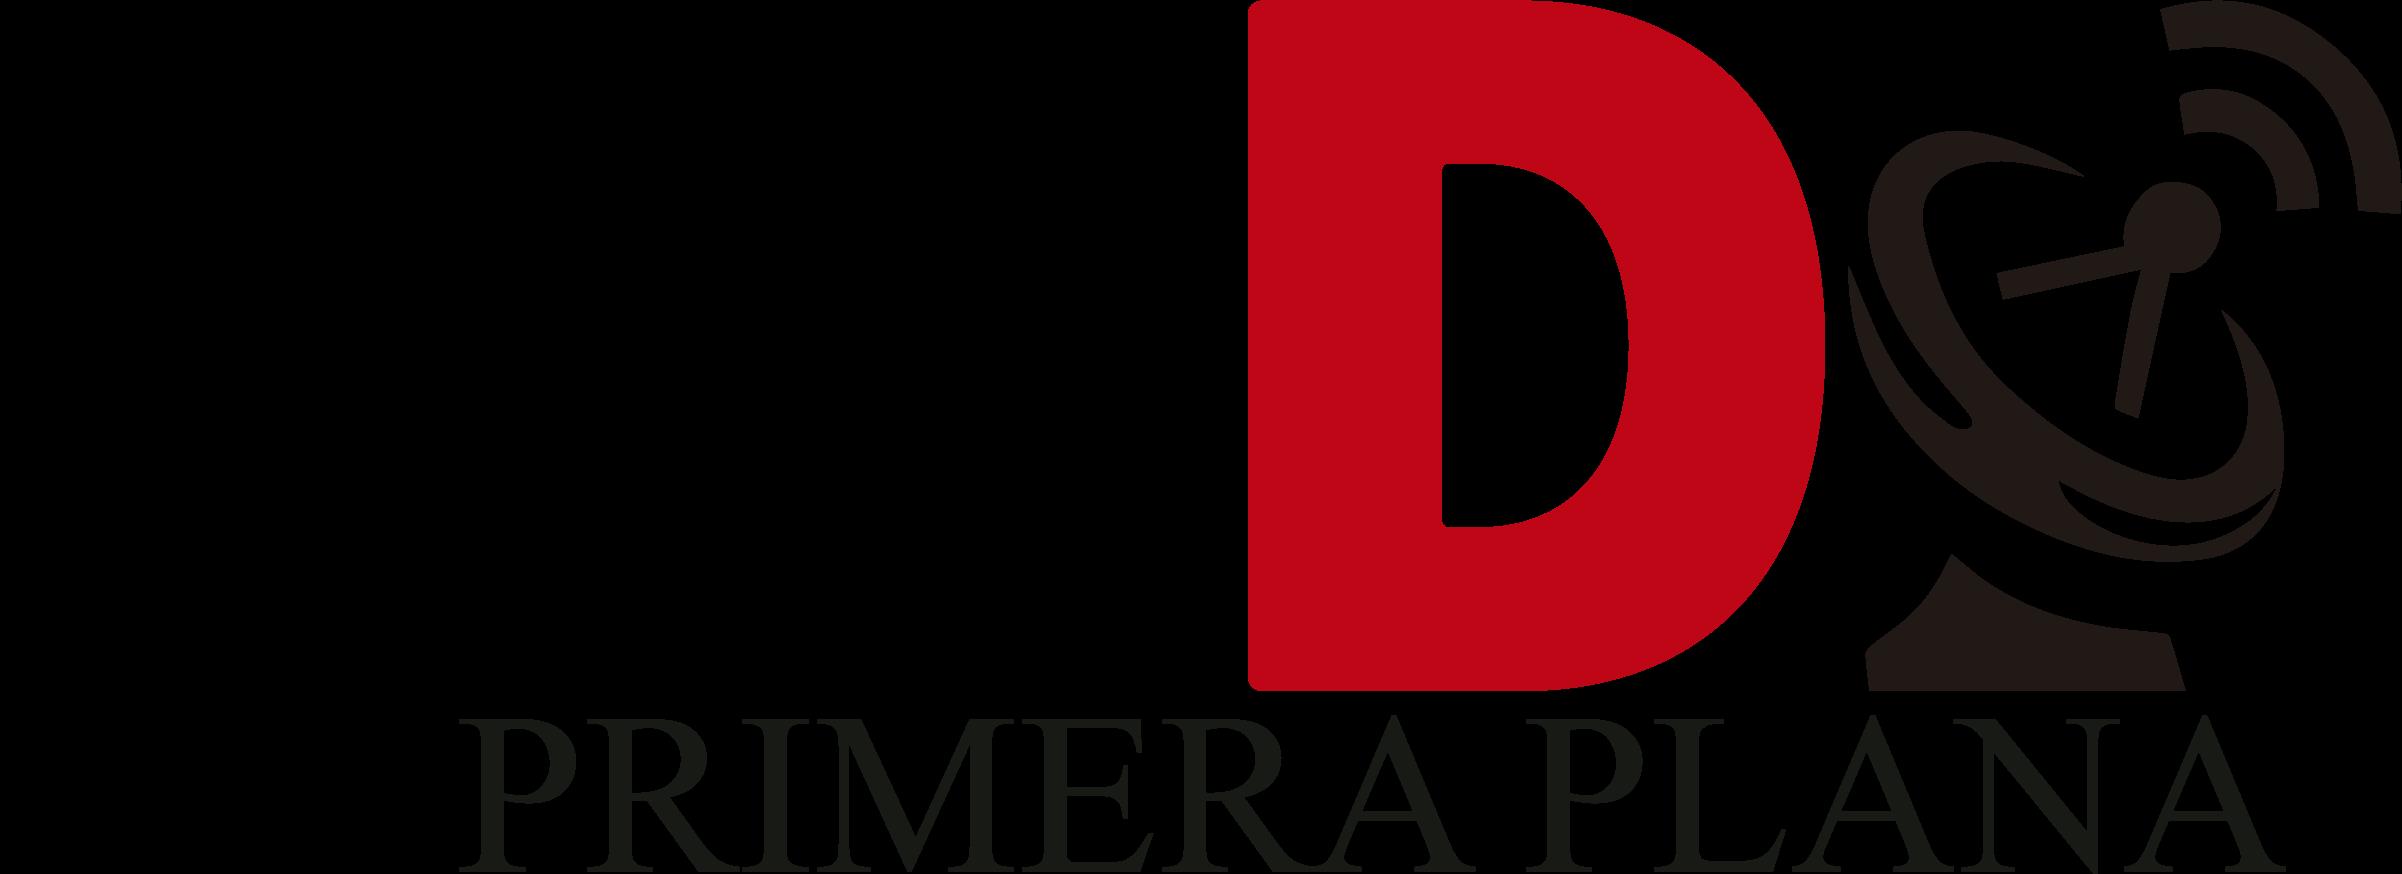 TVD Primera Plana